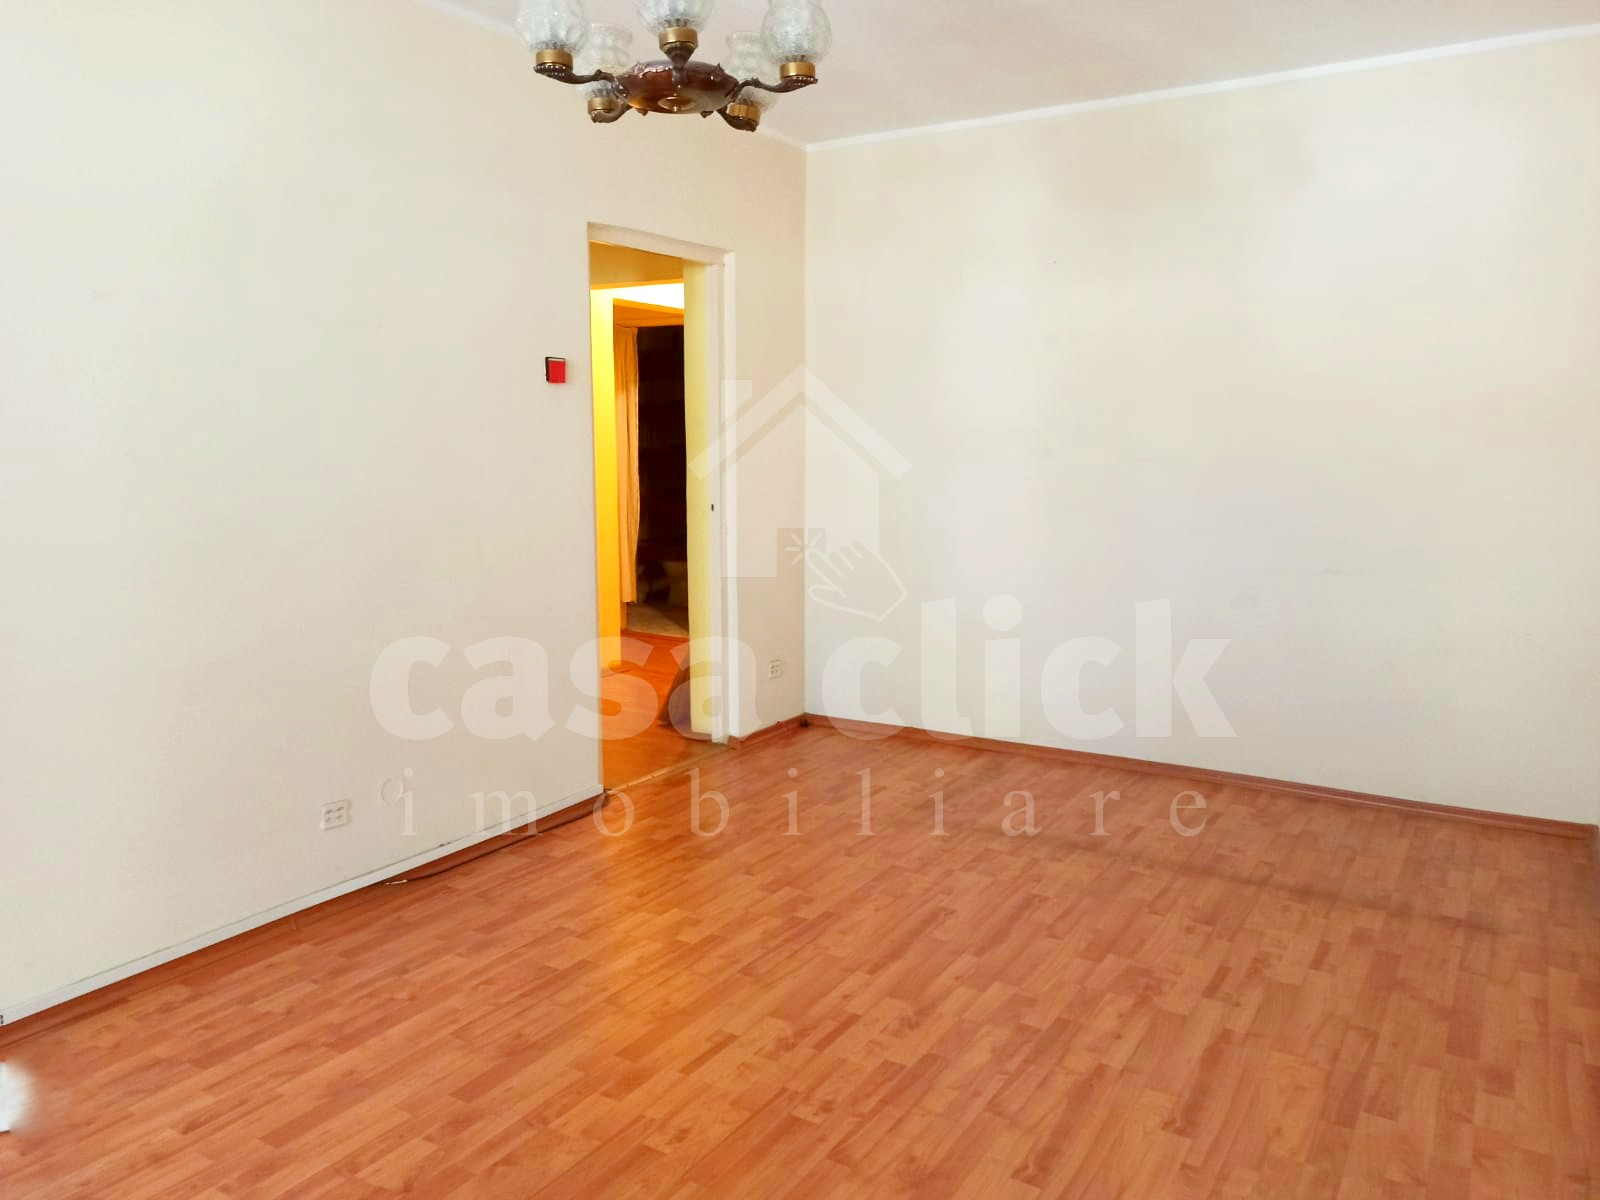 Apartament 3 camere, I.C.Frimu, etaj 3, centrala termica